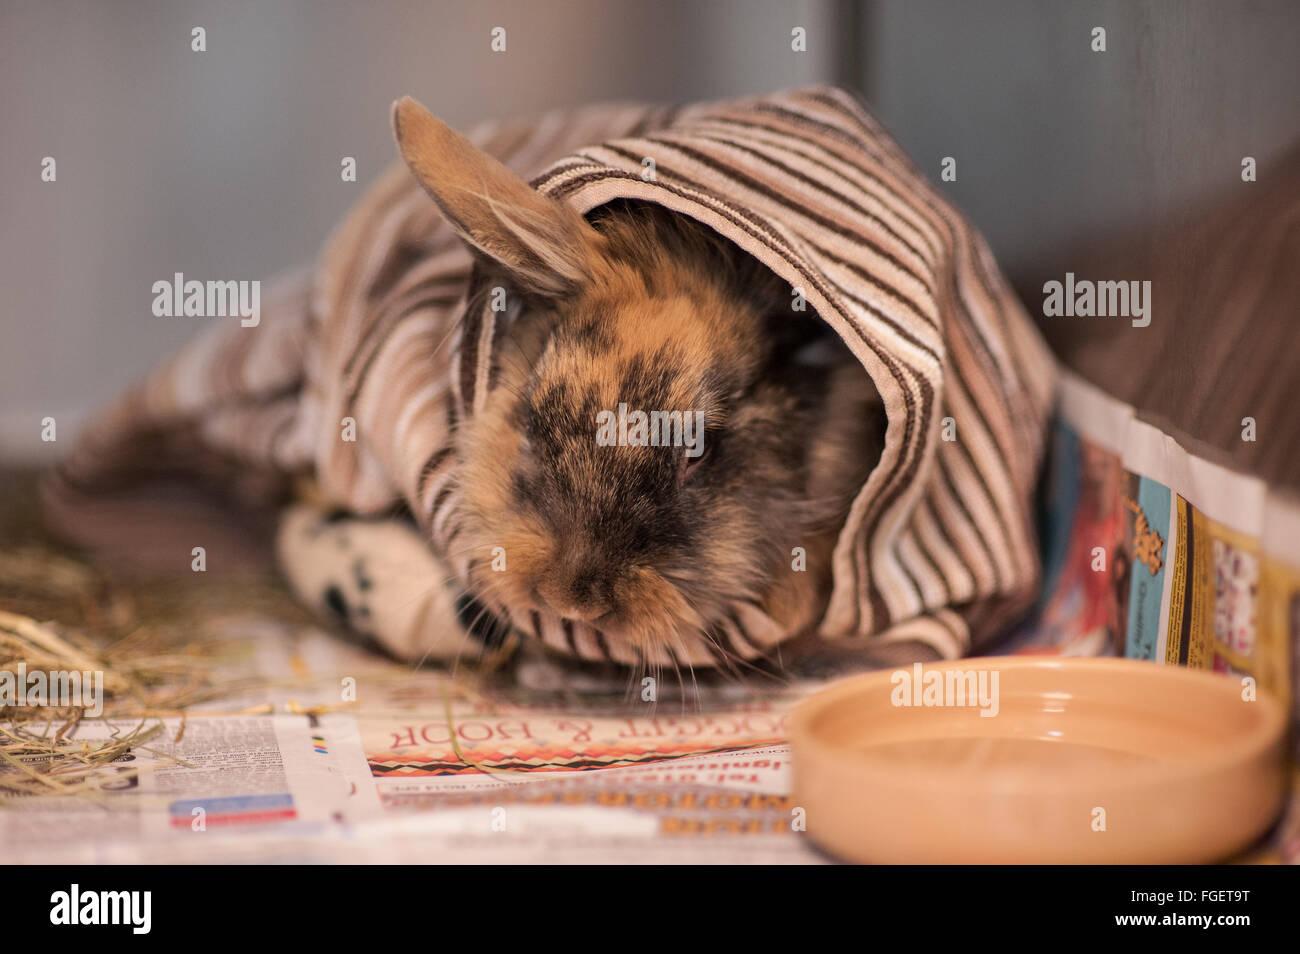 Rabbit Care post surgery - Stock Image